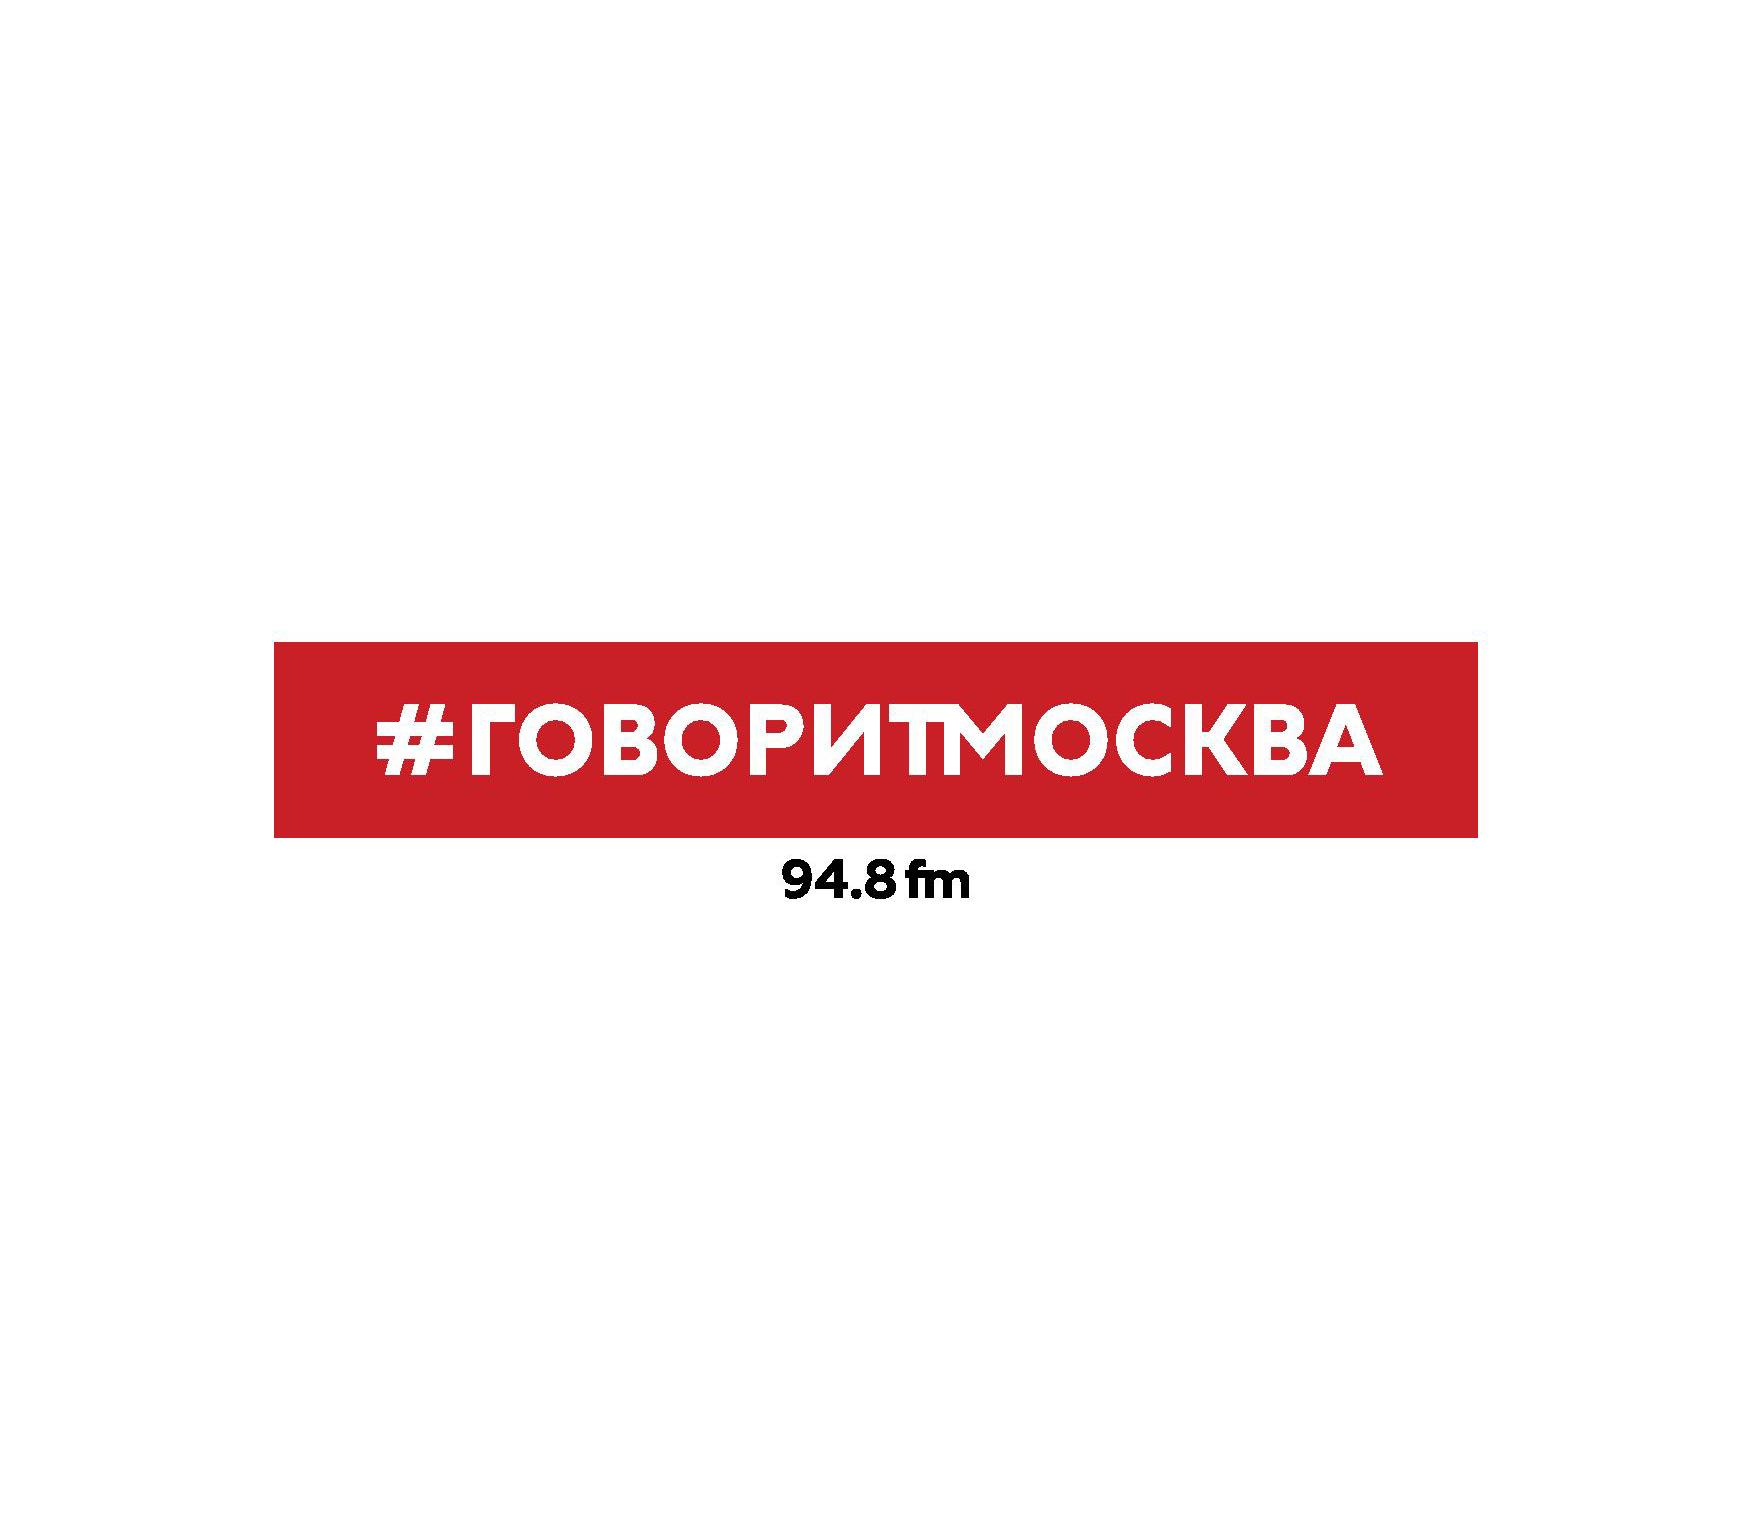 Макс Челноков 29 апреля. Андрей Фефелов макс челноков 14 апреля андрей орлов